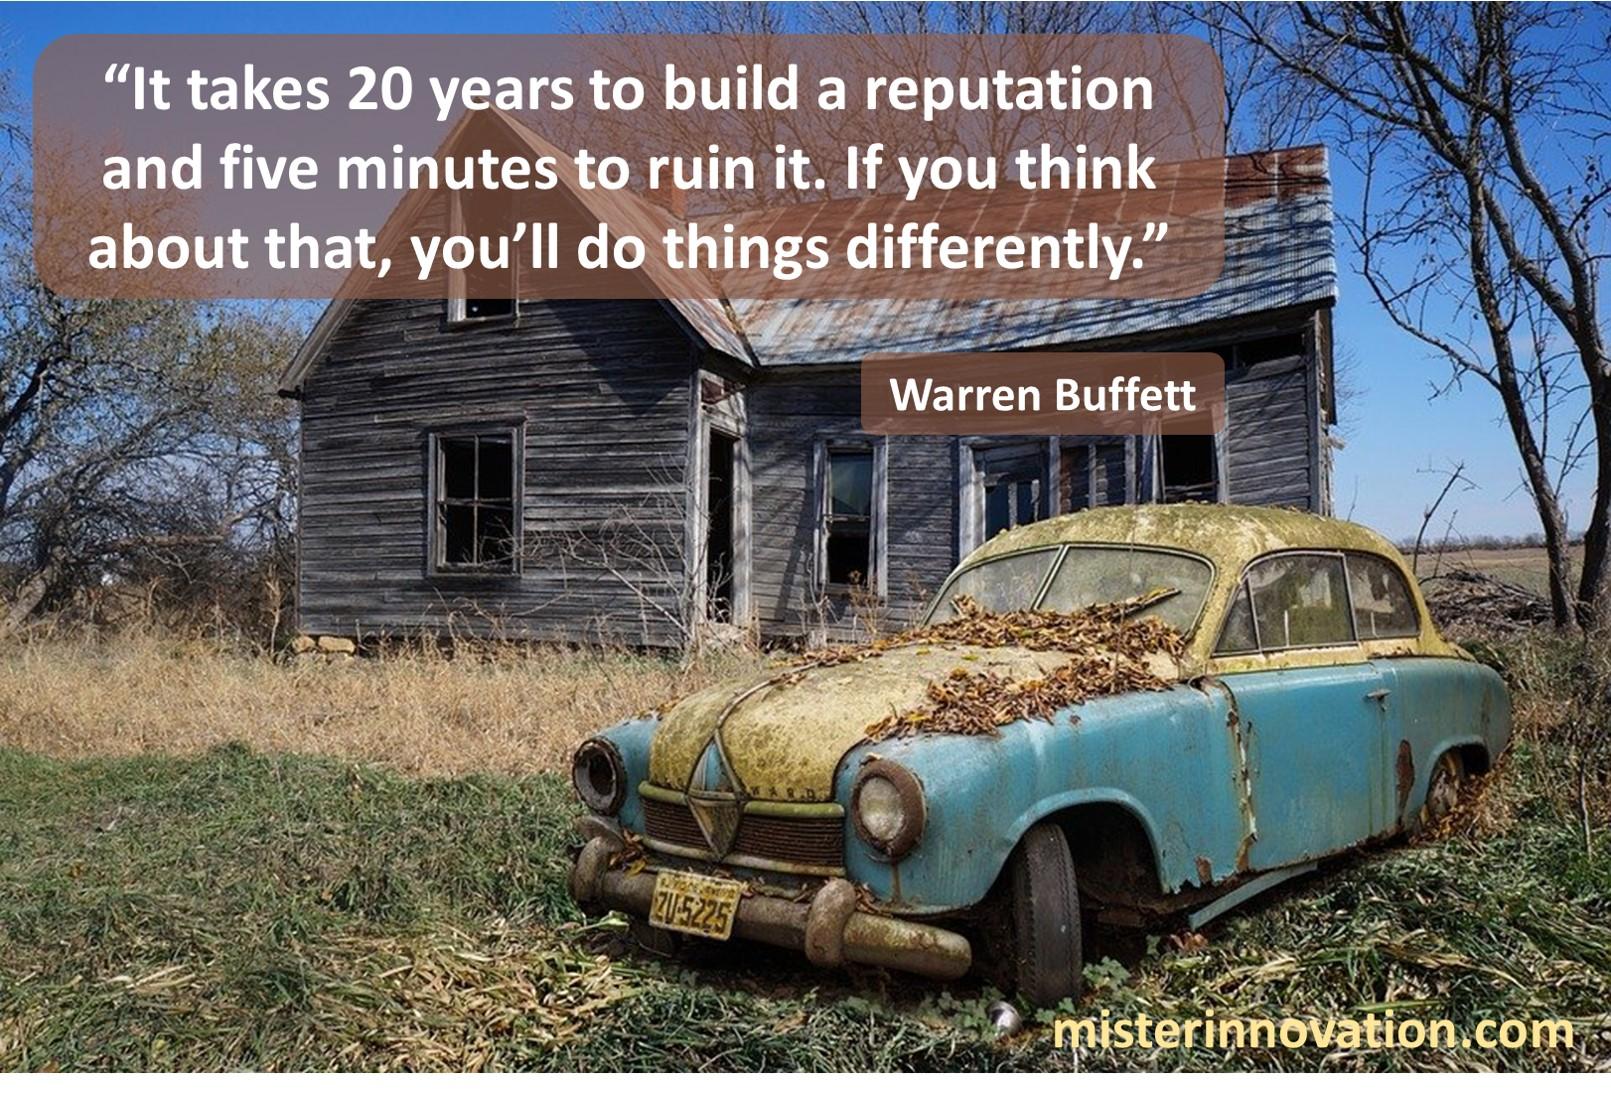 Warren Buffett Reputation